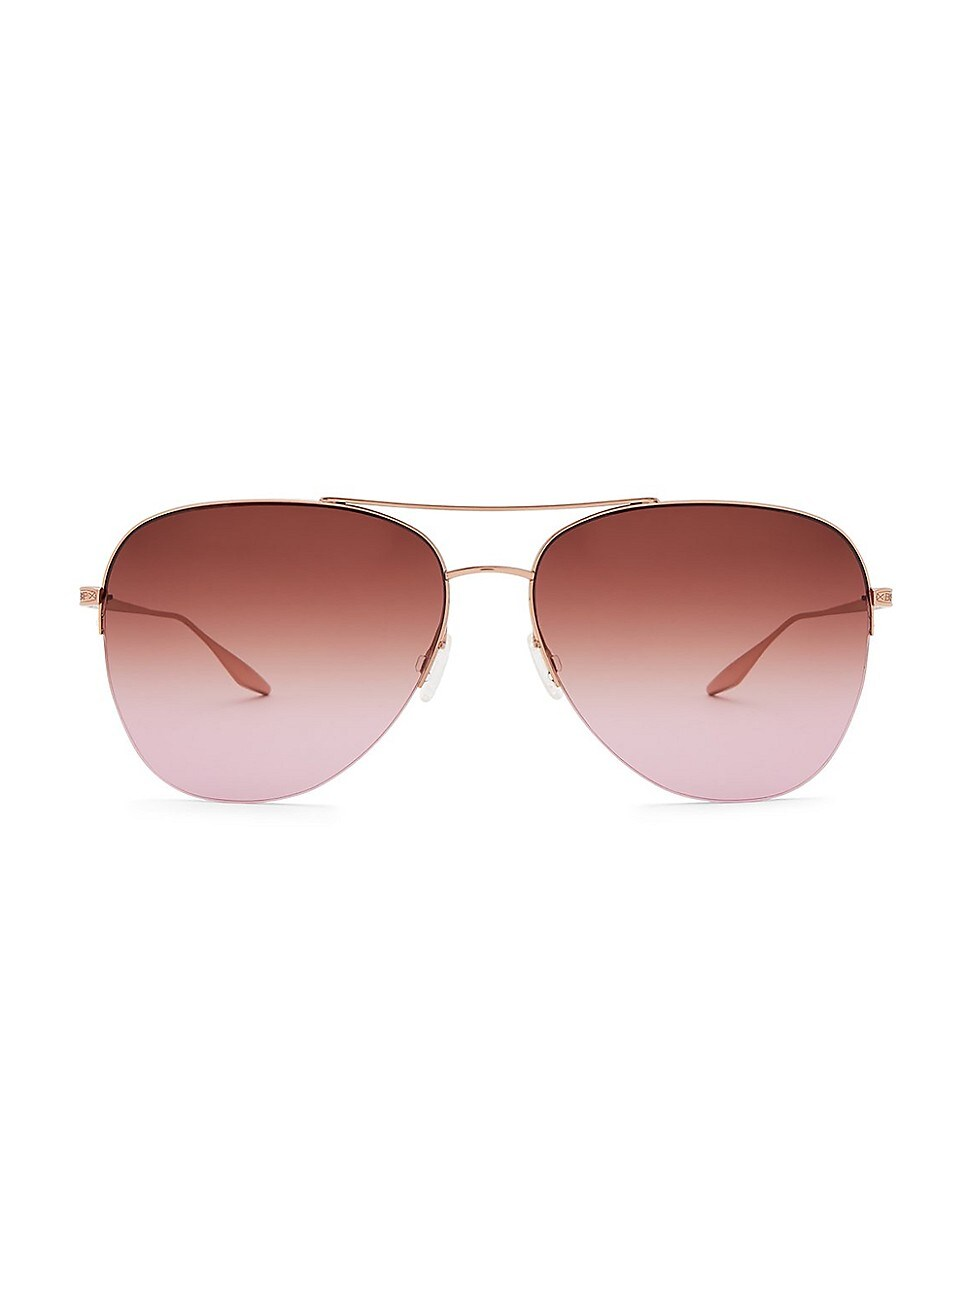 Barton Perreira WOMEN'S CHEVALIER 62MM AVIATOR SUNGLASSES - ROSE GOLD